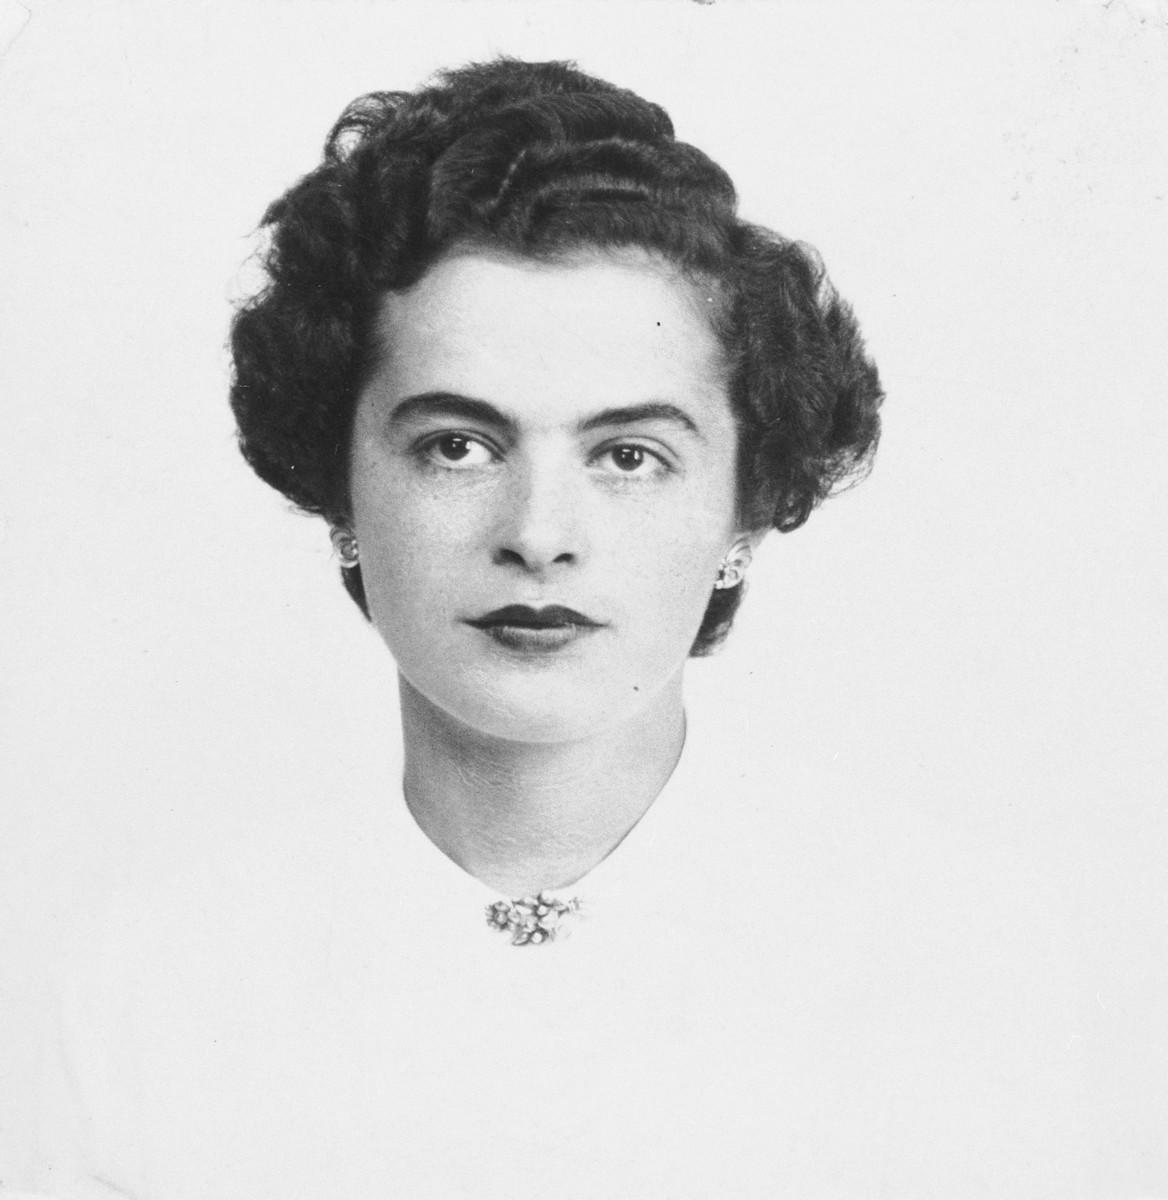 Portrait of Manya Moszkowicz.